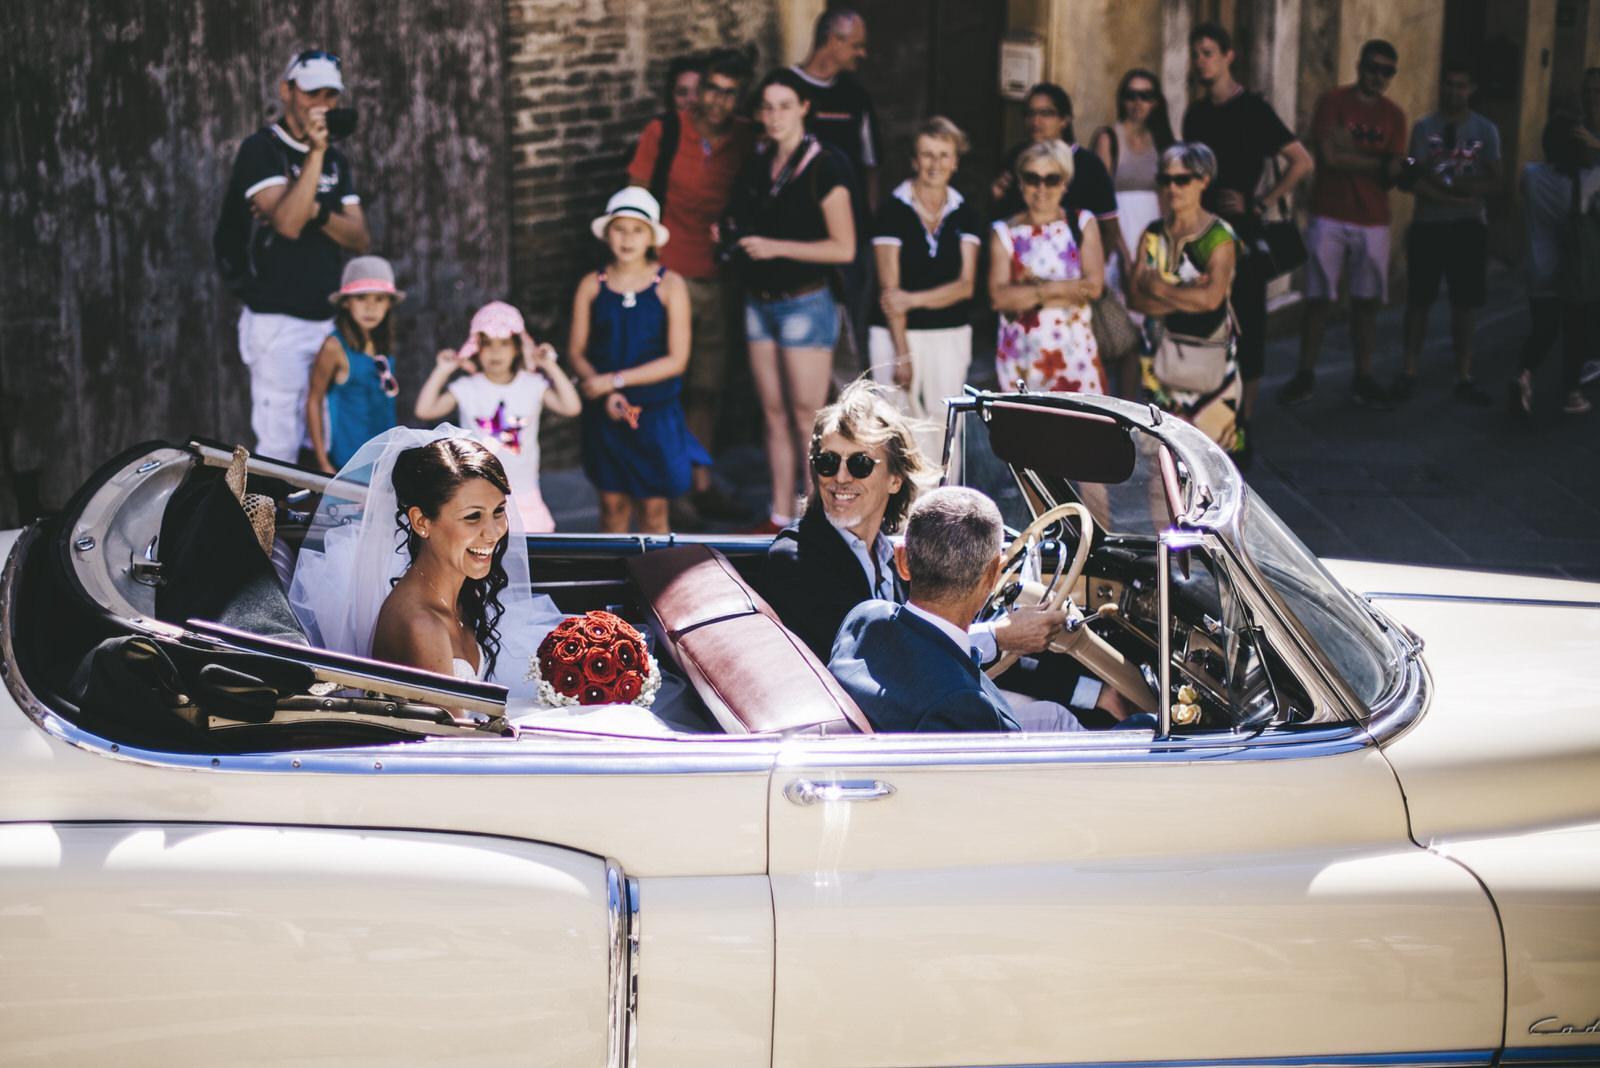 wedding photographer in italy-venice-tuscany-florence-amalfi coast-como lake-villa del balbianello-siena-amalfi-ravello-belmond-villa cimbrone25